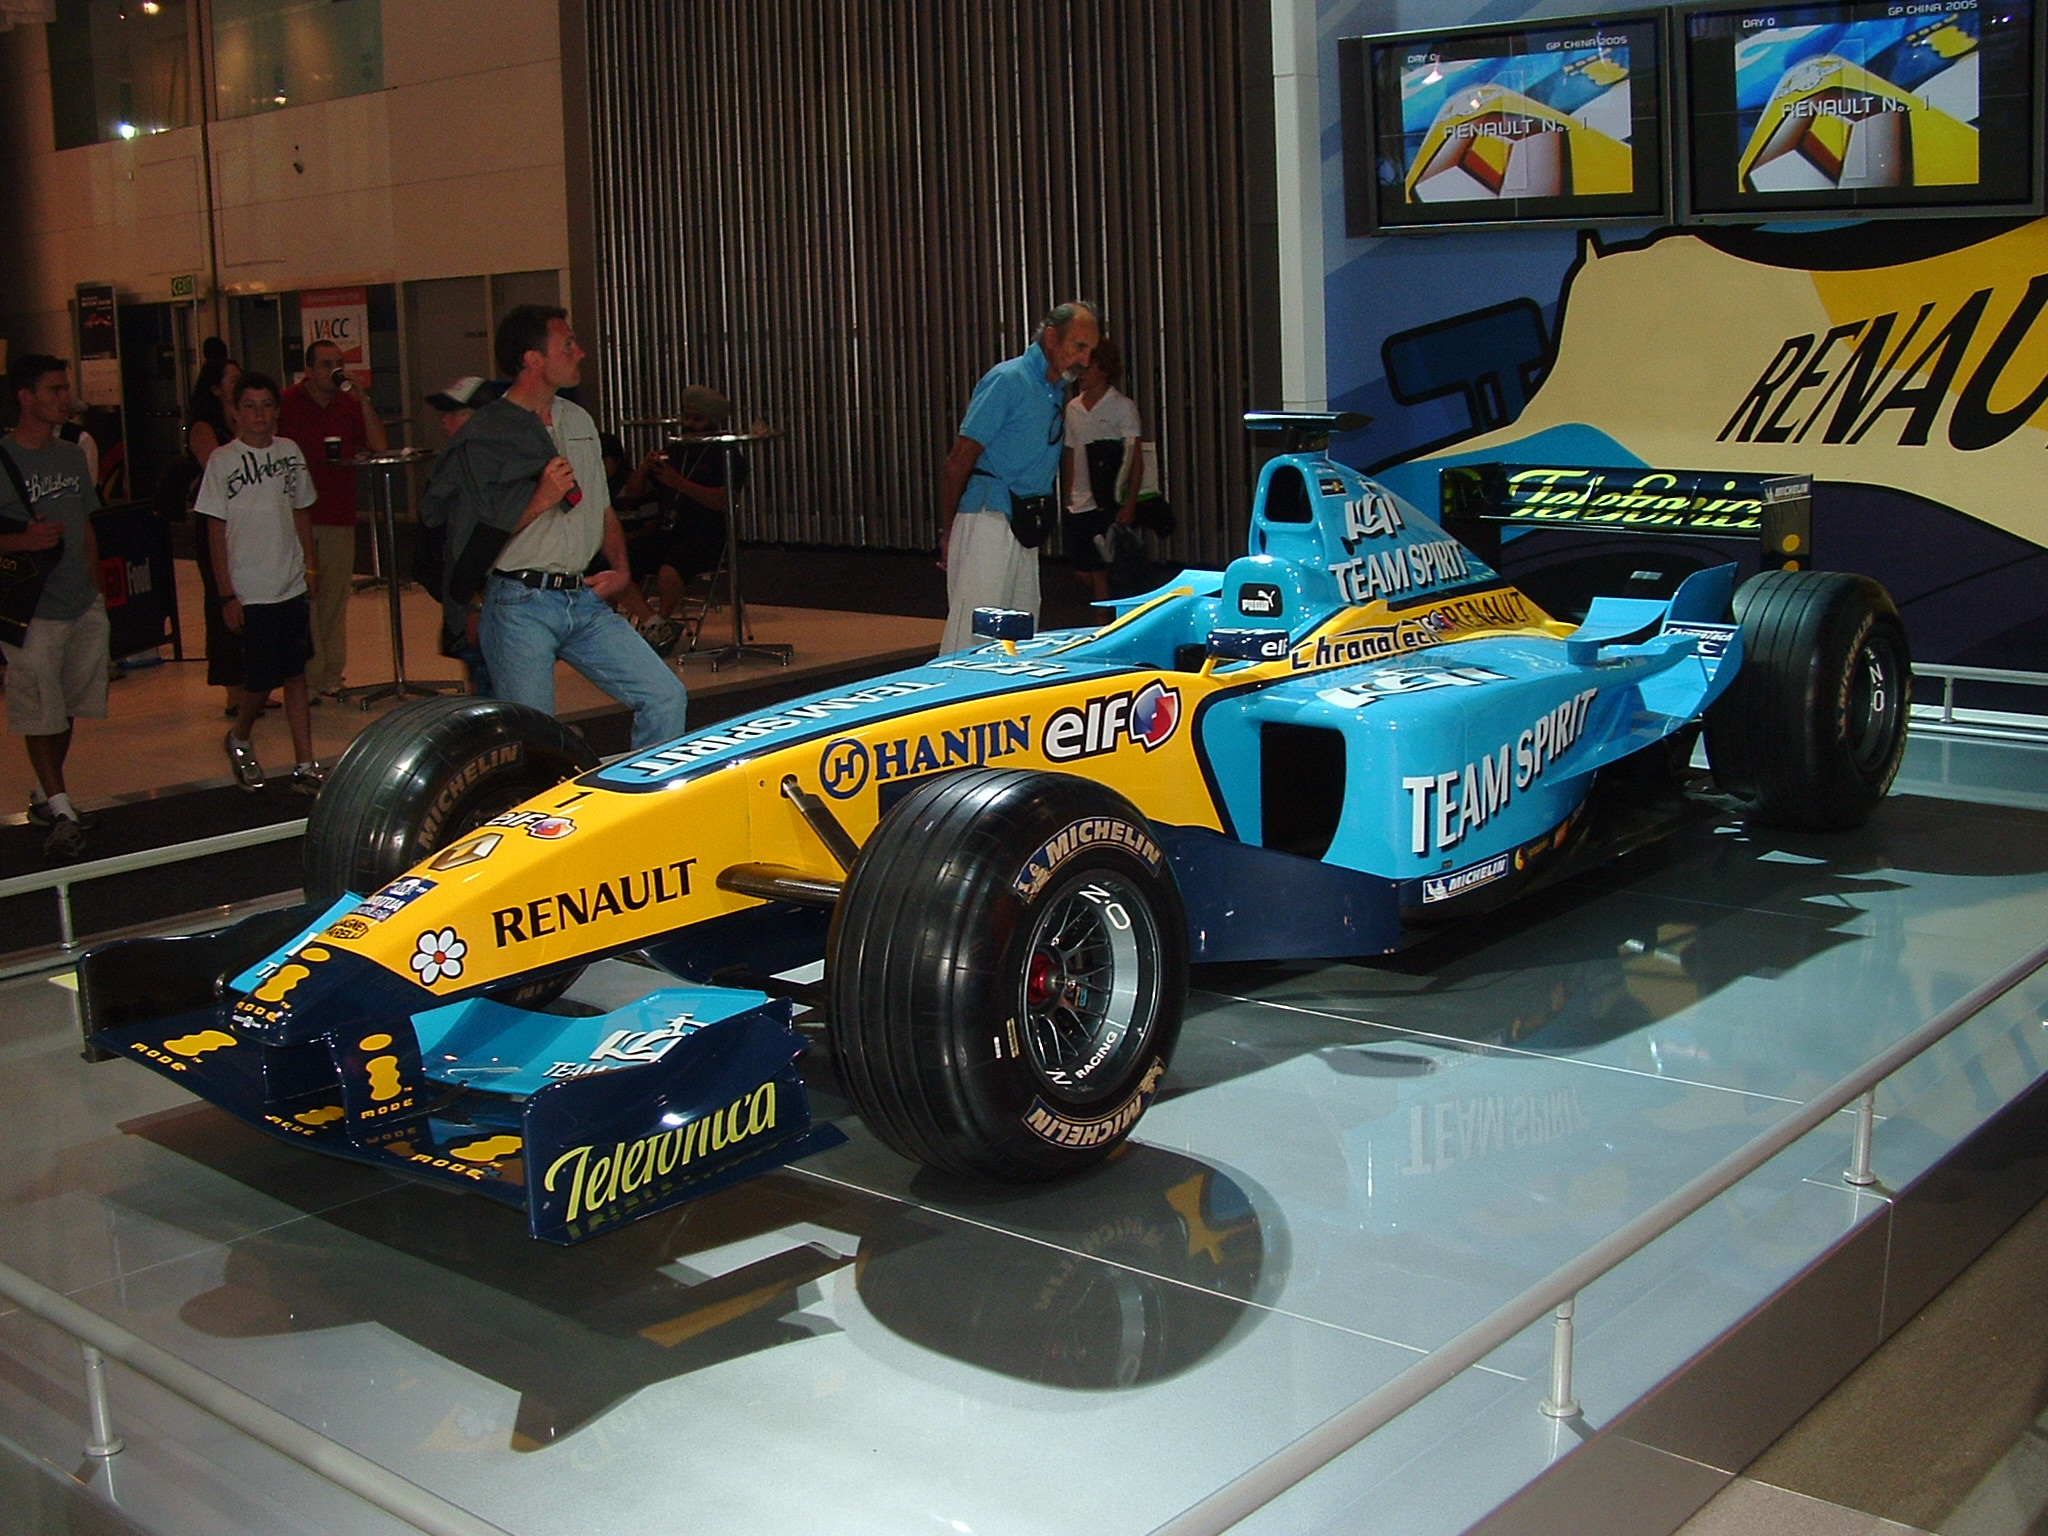 https commons wikimedia org wiki file renault r25 display car jpg